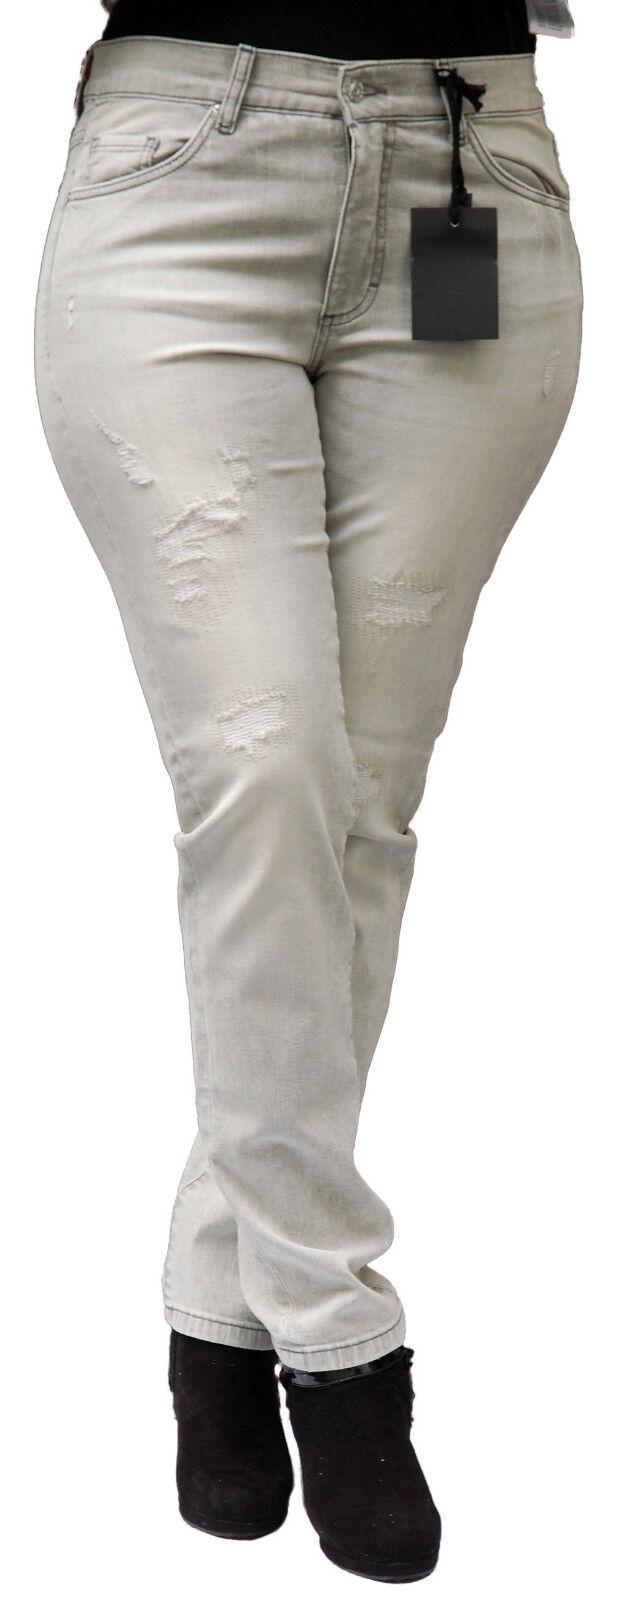 Angels Jeans Skinny destroy Light grau used Buffi Art.363